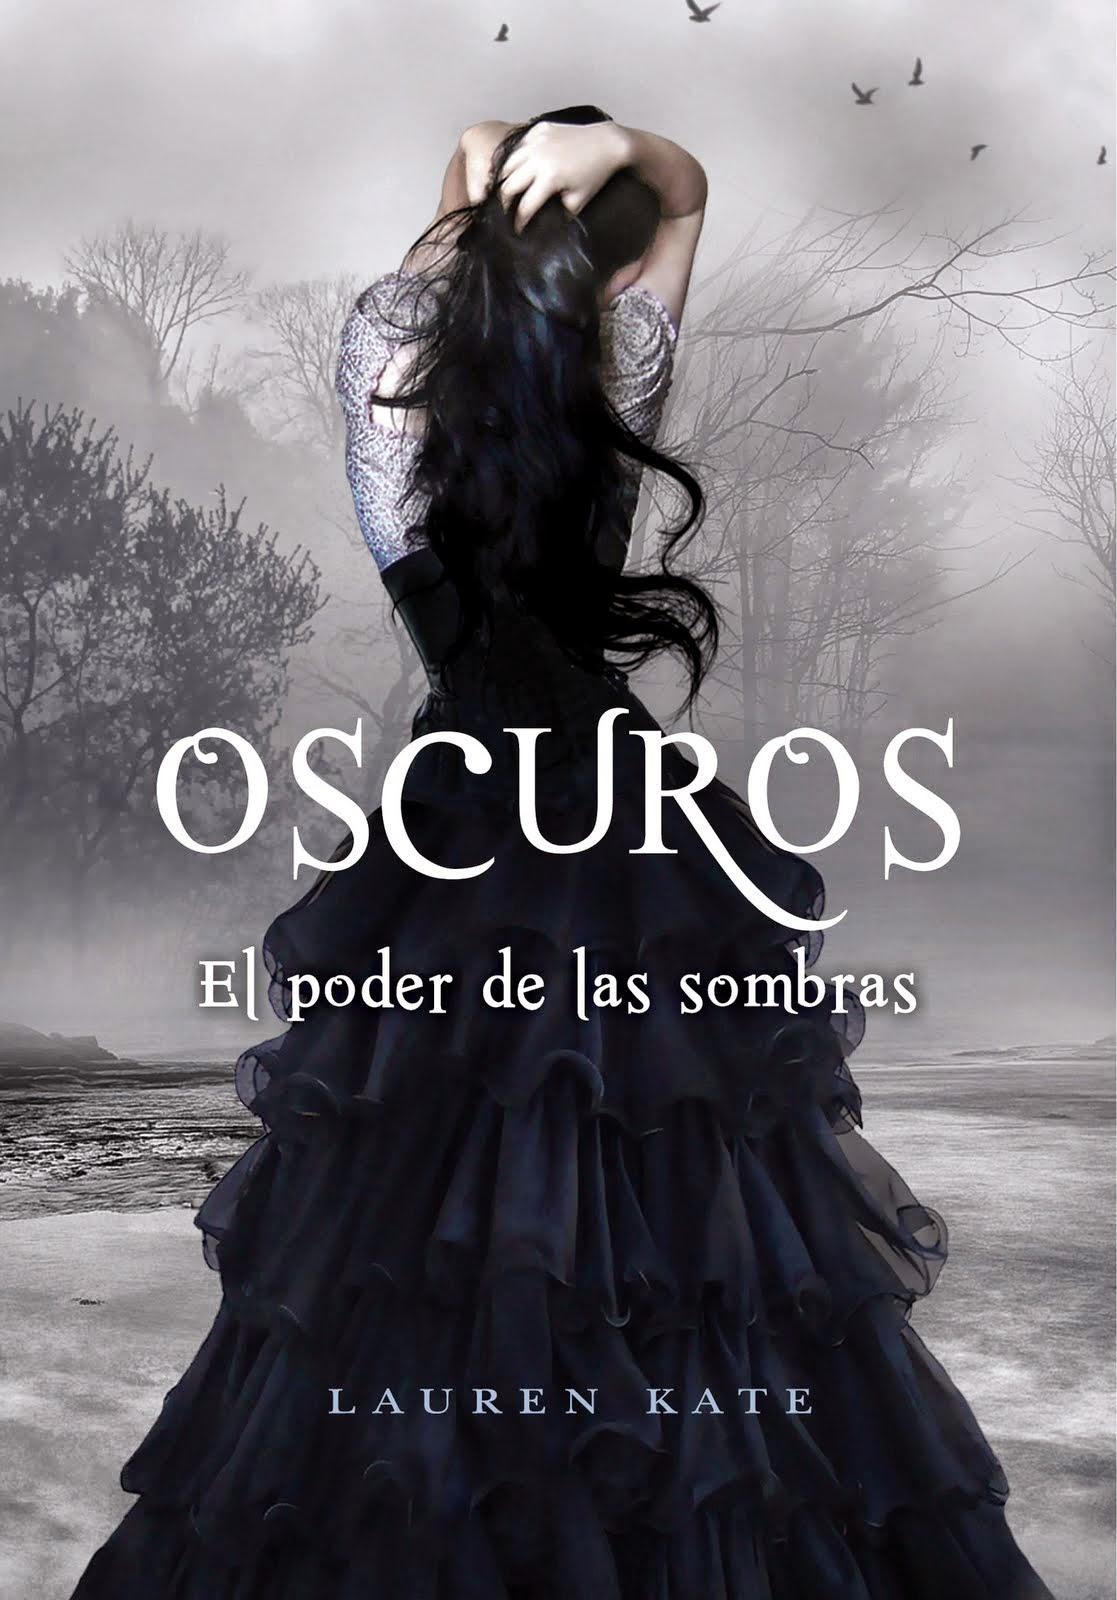 http://entrelibrosytintas.blogspot.com.es/2014/05/resena-oscuros-el-poder-de-las-sombras.html